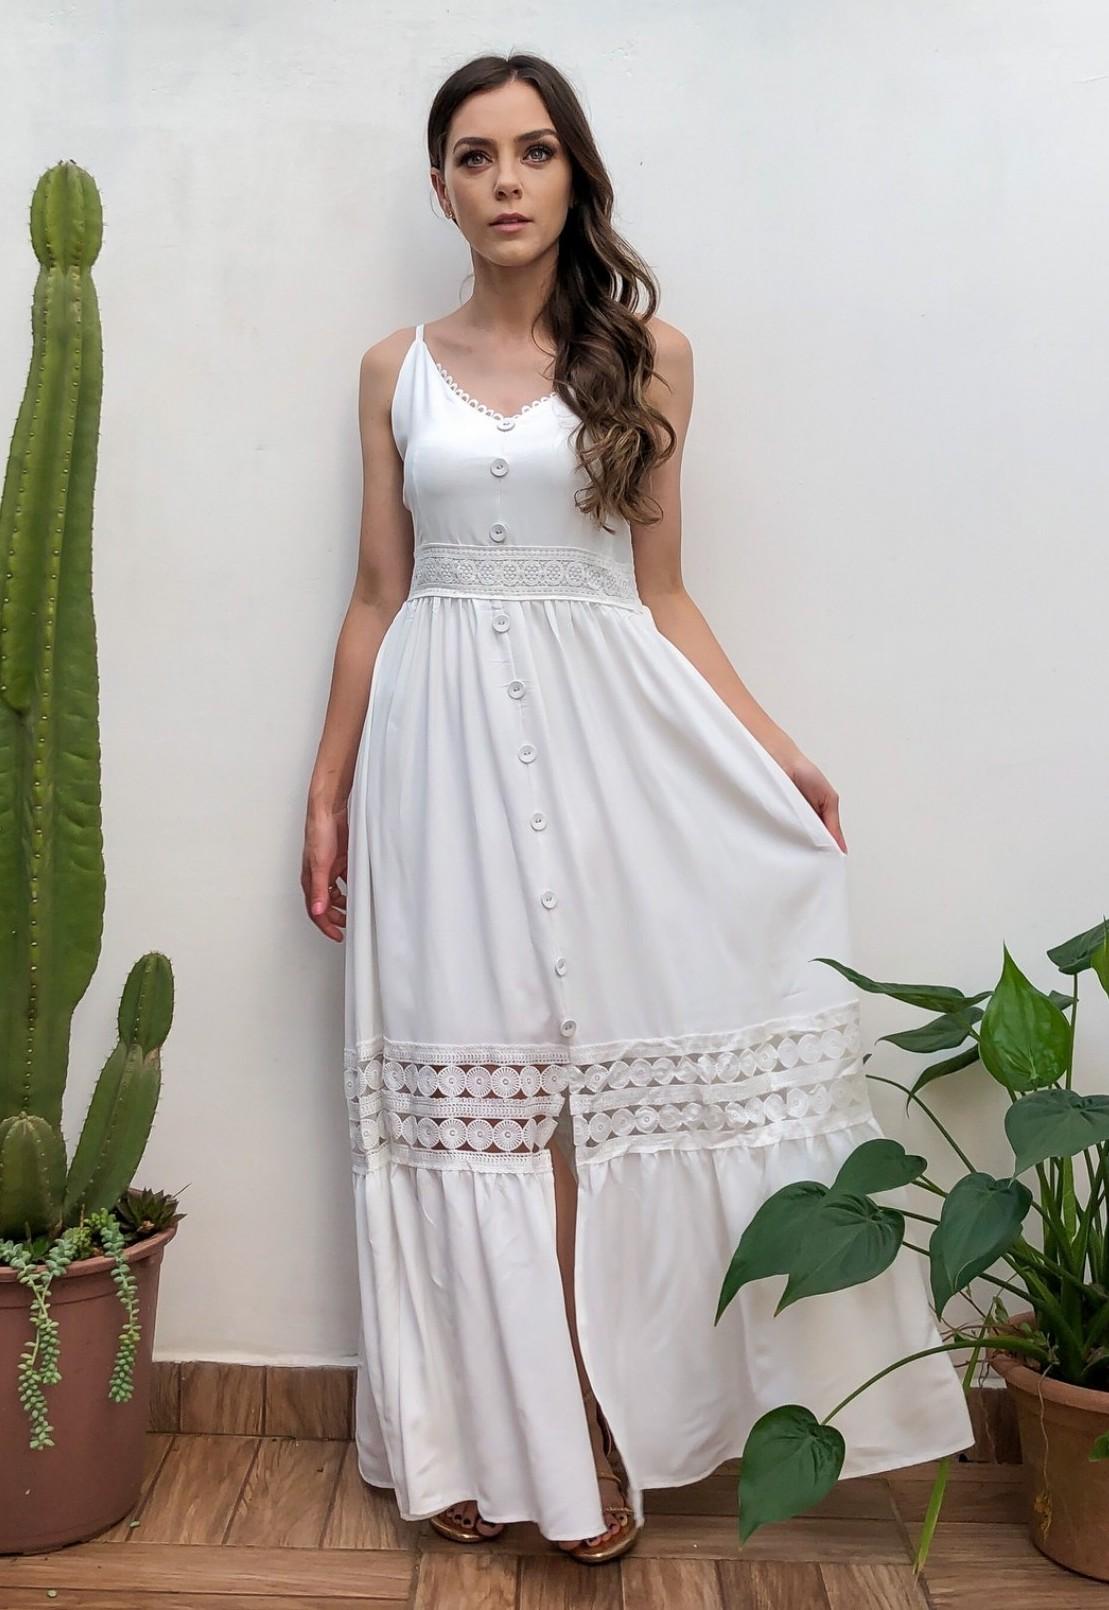 Vestido Longo Alças Rodado Branco/Off White